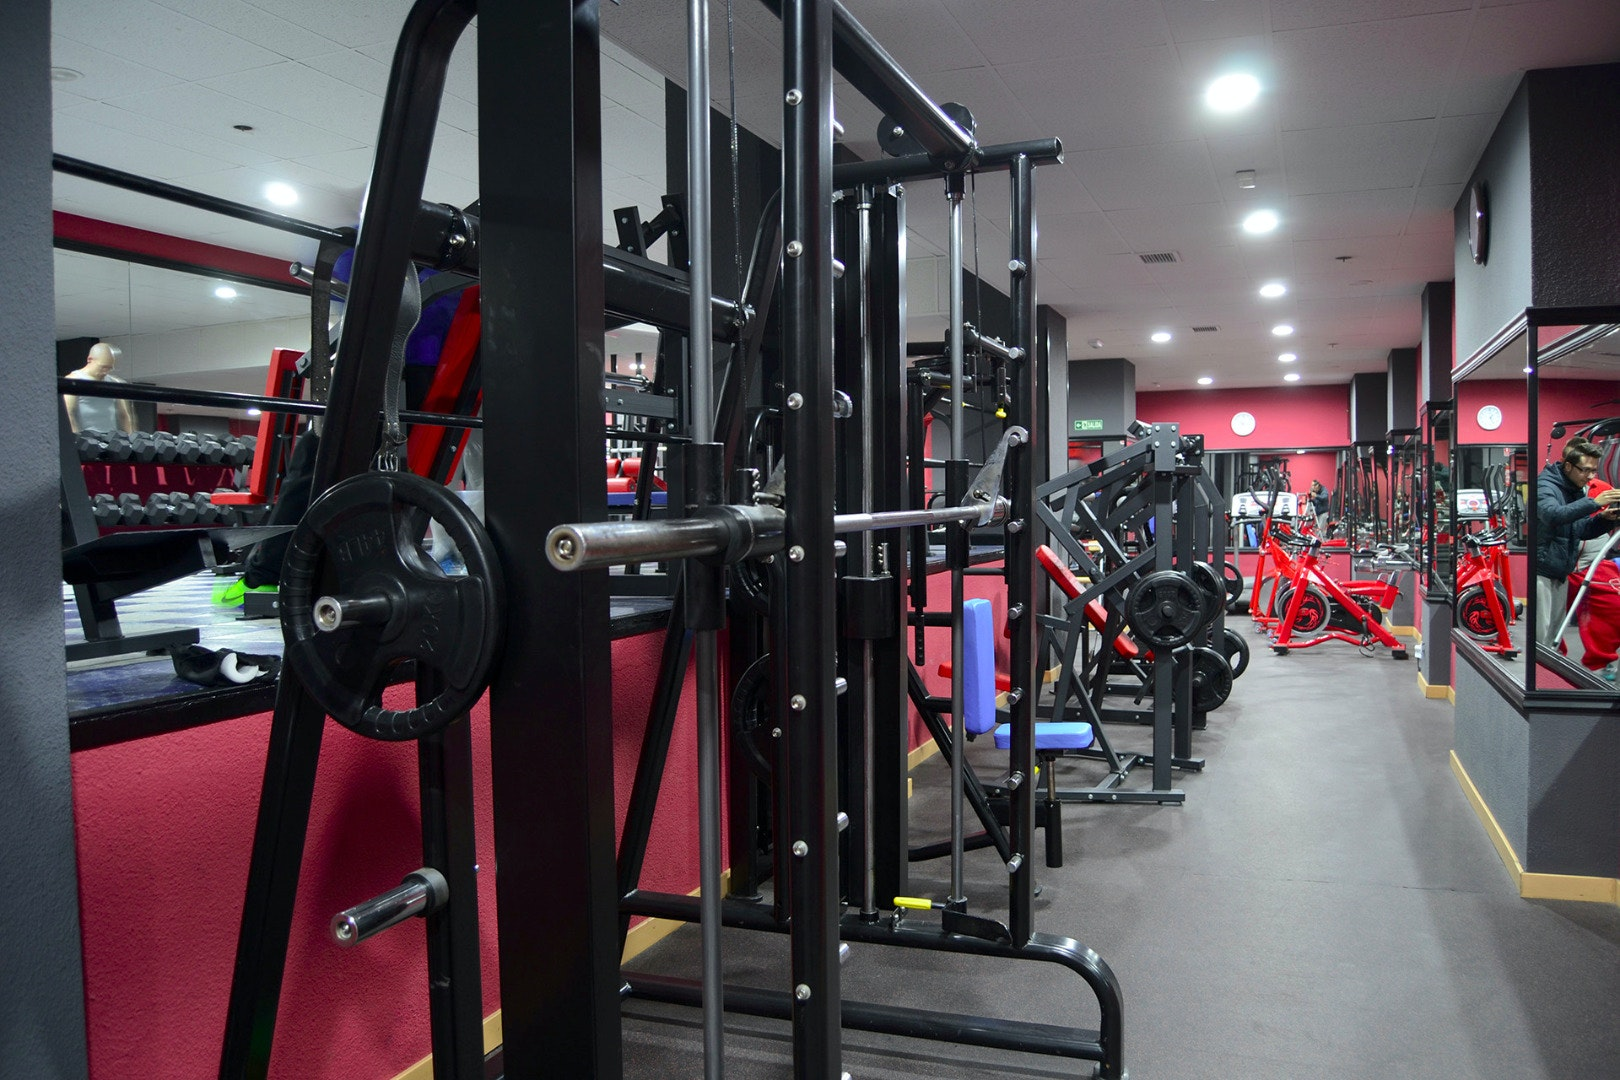 Foto 6 Oferta Gimnasio Pulsaciones Gym Palencia - GymForLess